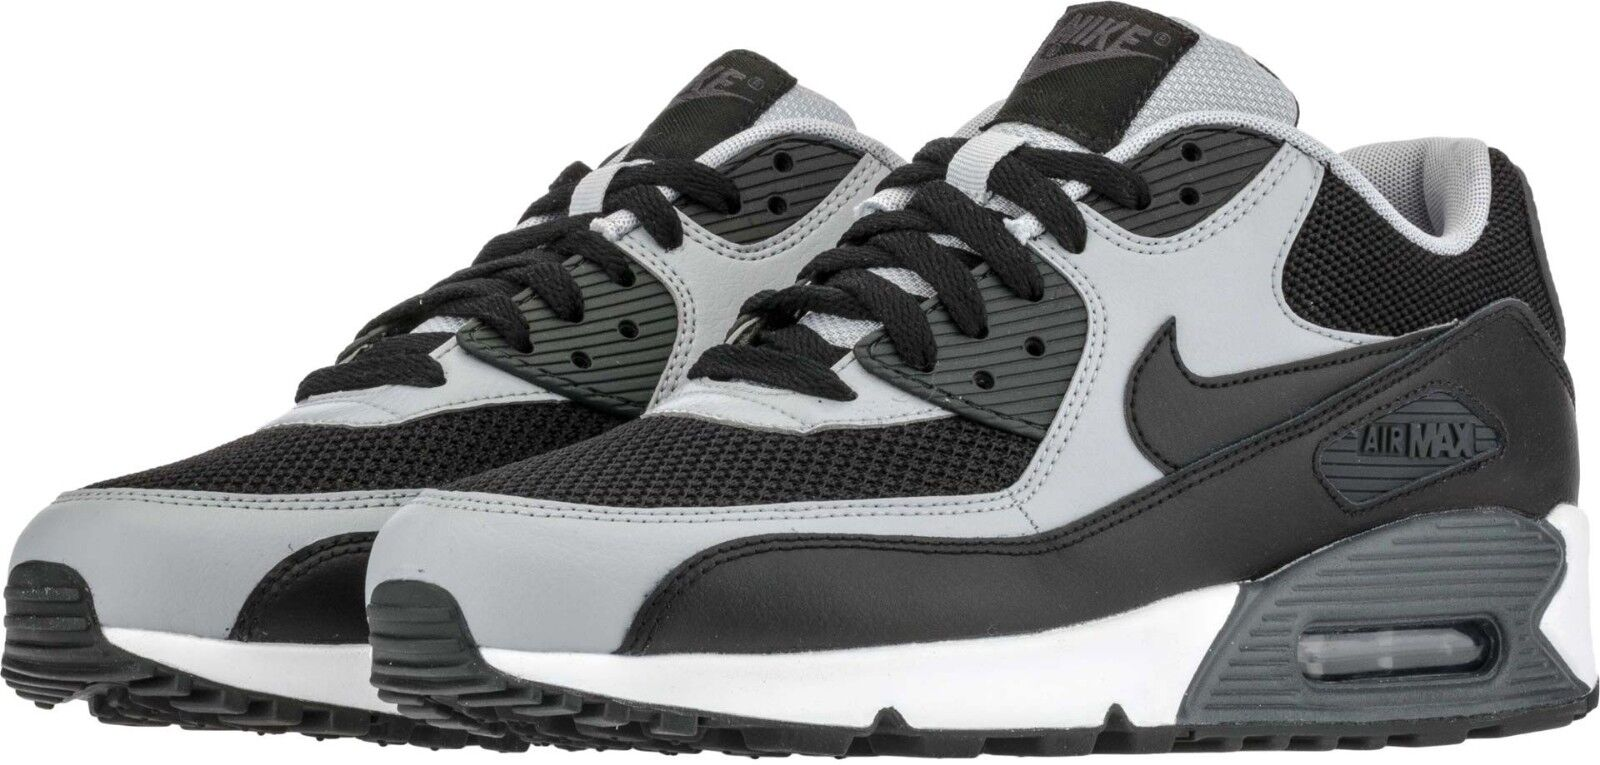 Air Max '90 Essential Men's Running shoes Black Grey Sizes 8-13 NIB 537384-053